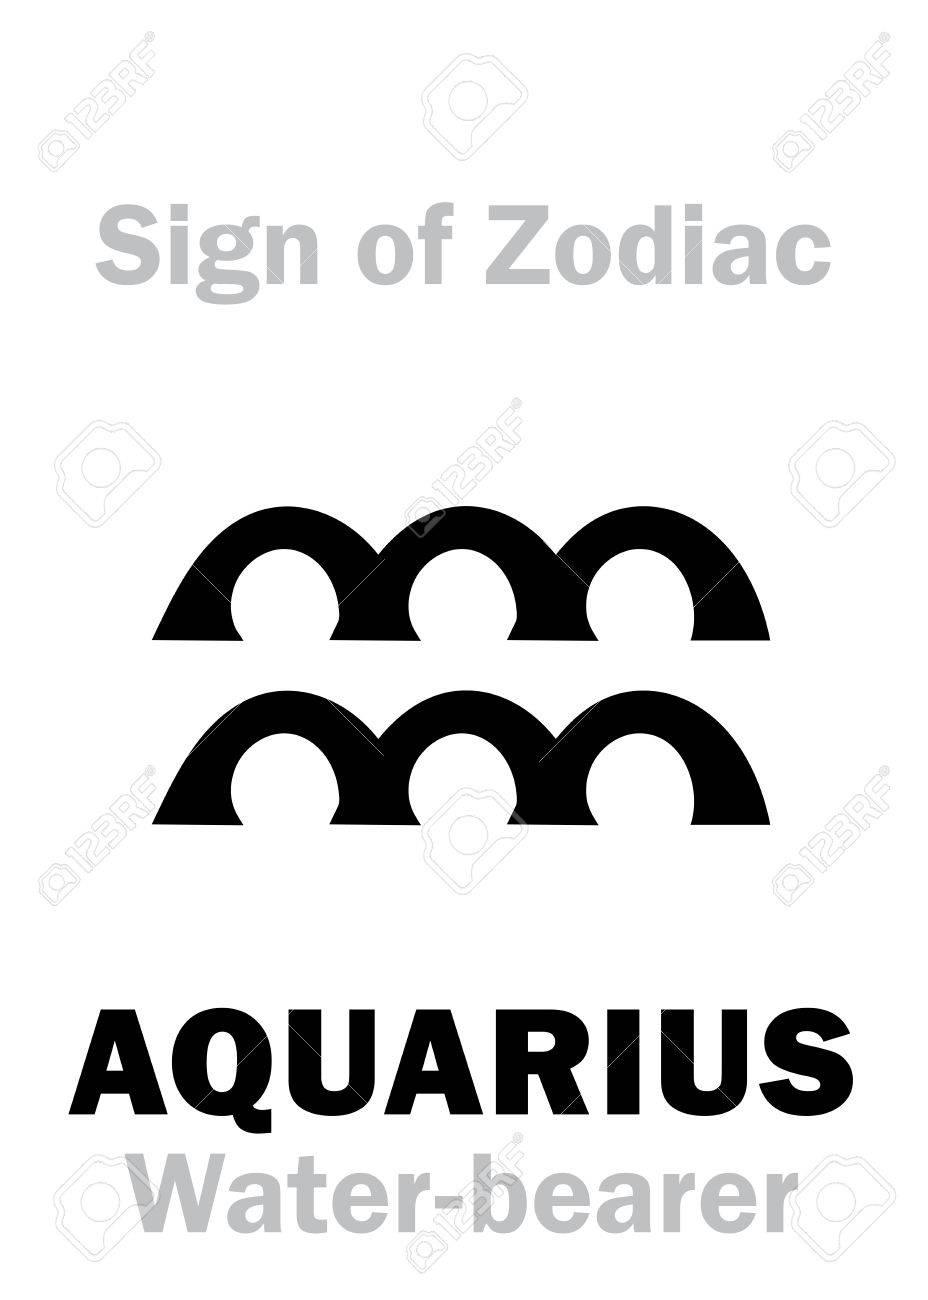 Astrology alphabet sign of zodiac aquarius the water bearer astrology alphabet sign of zodiac aquarius the water bearer hieroglyphics character biocorpaavc Choice Image